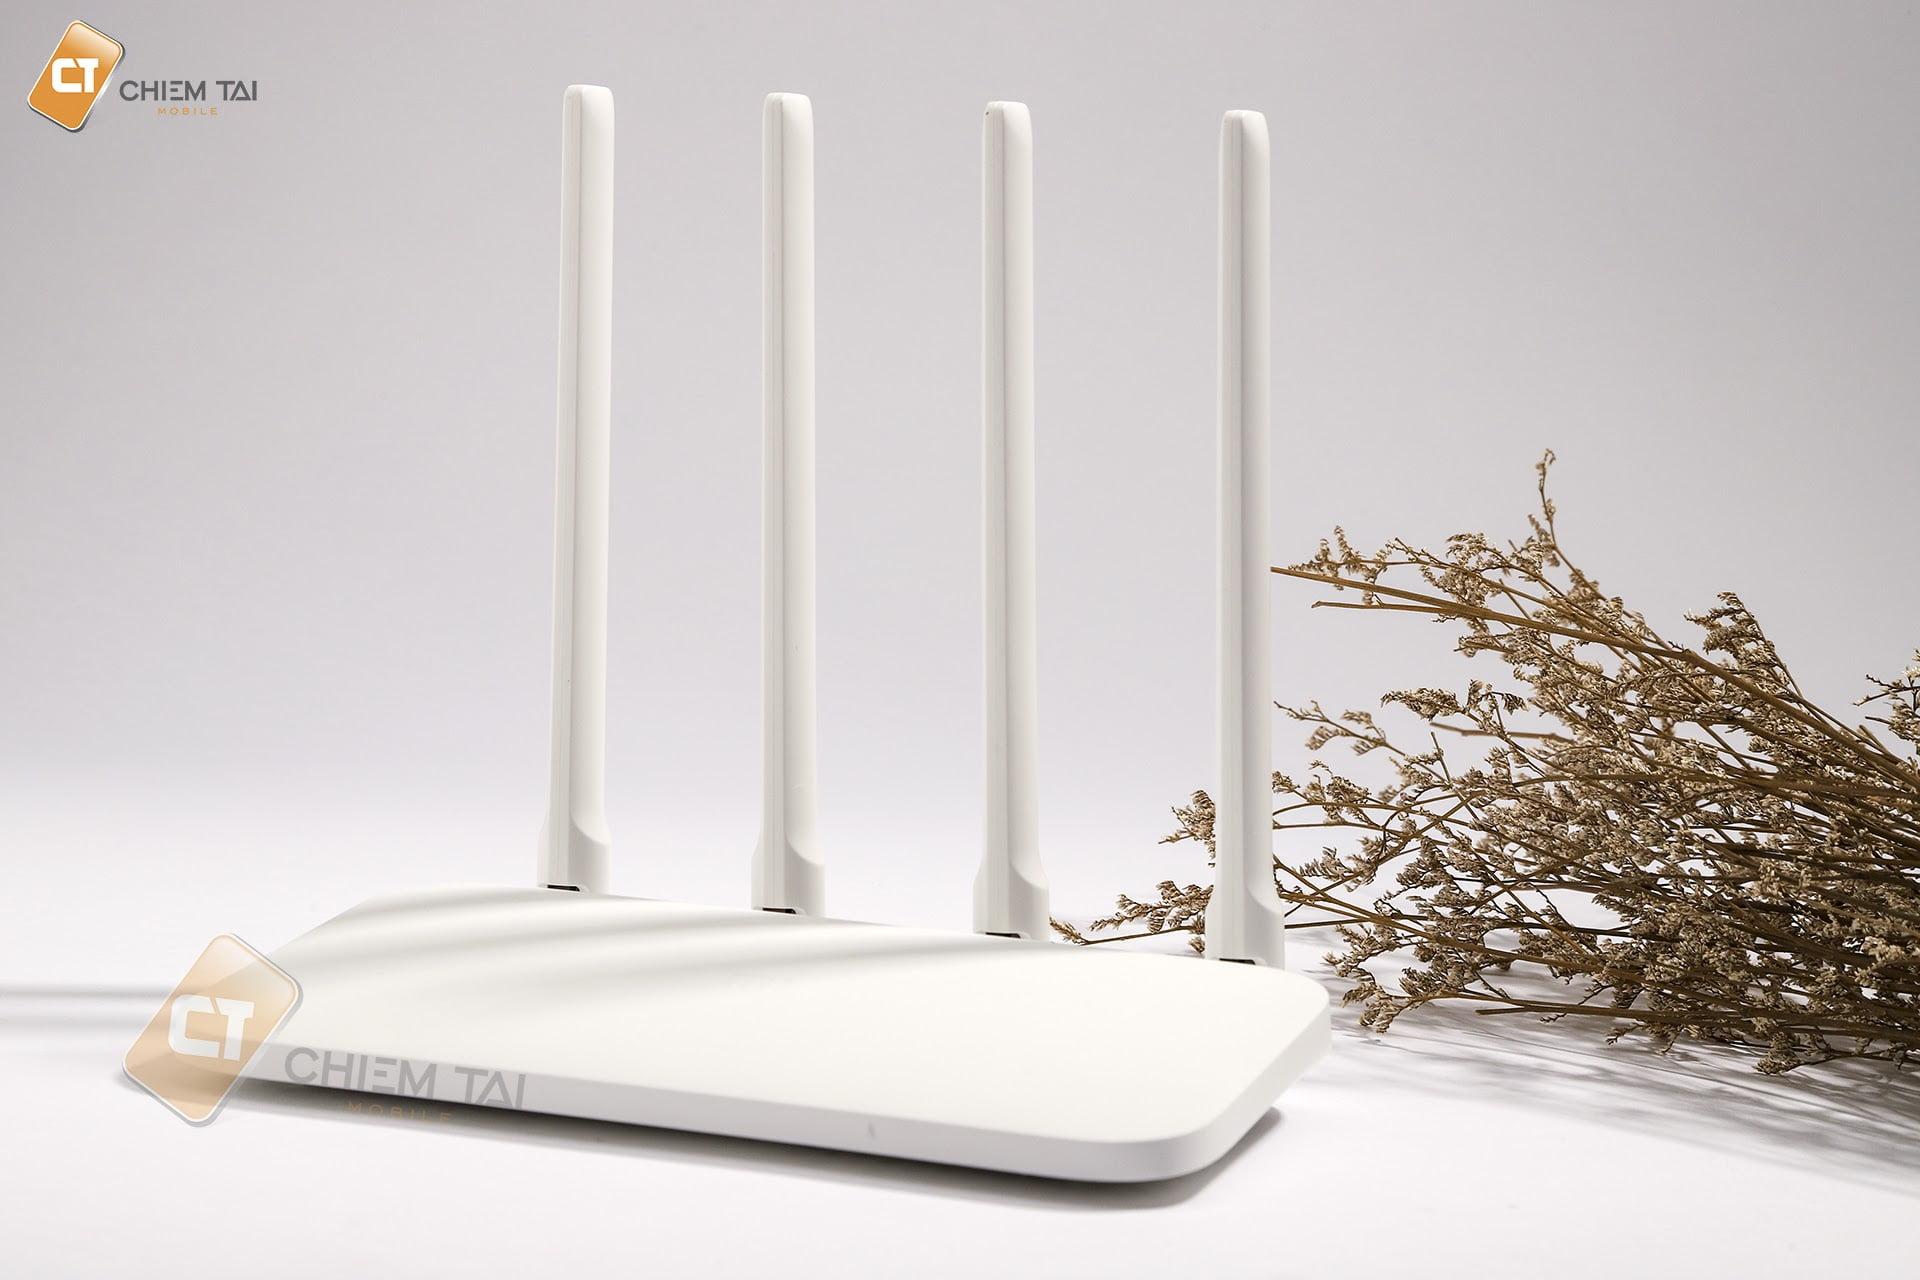 router wifi xiaomi 4c ban quoc te 6007fca1312fe